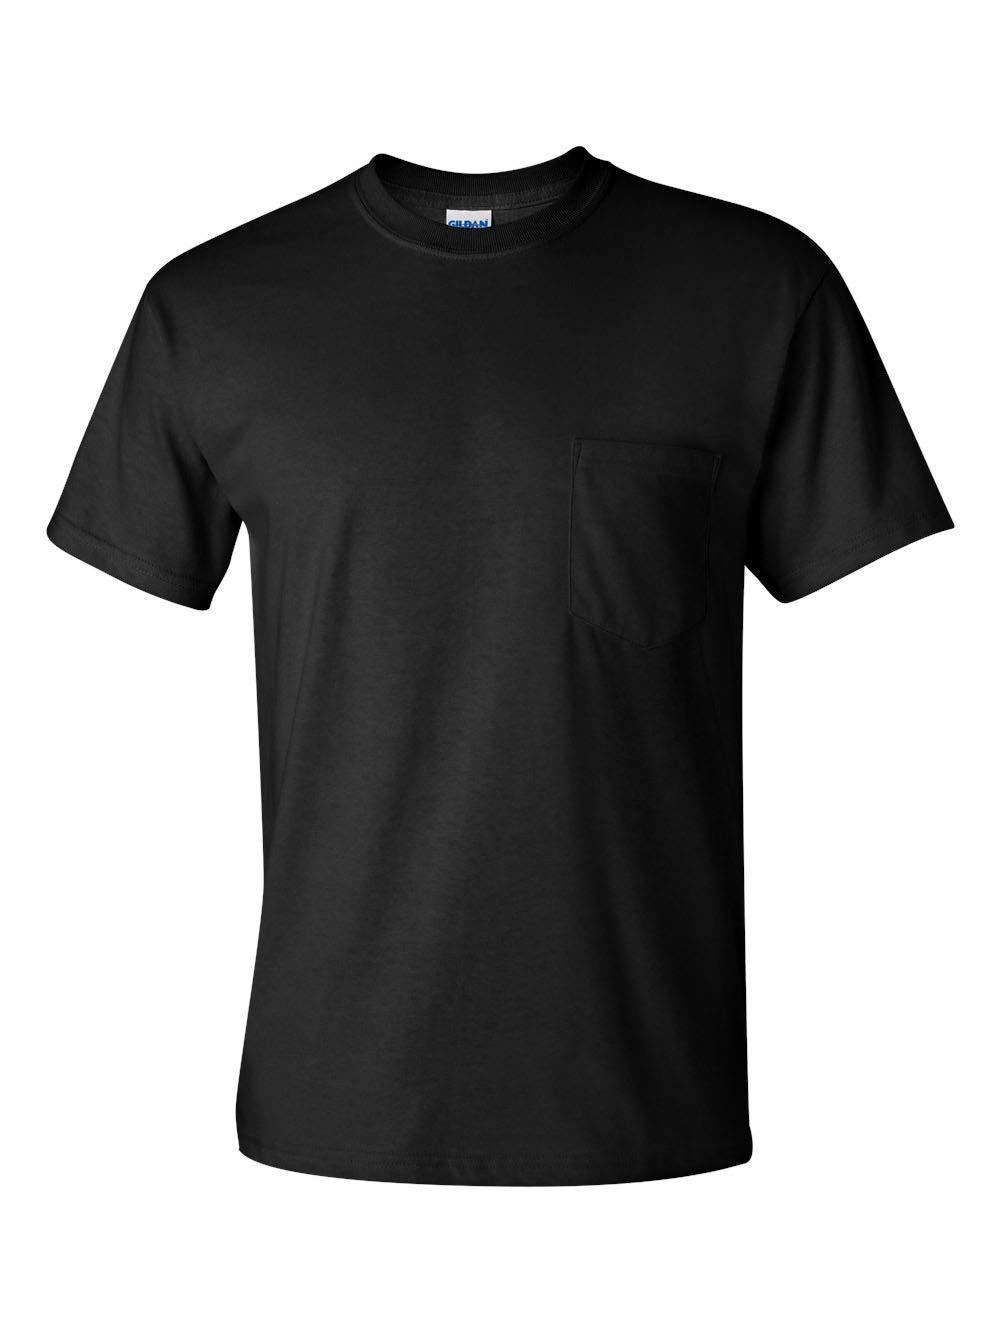 Gildan Men's 2-Pack Workwear Pocket T-Shirt, Black, X-Large